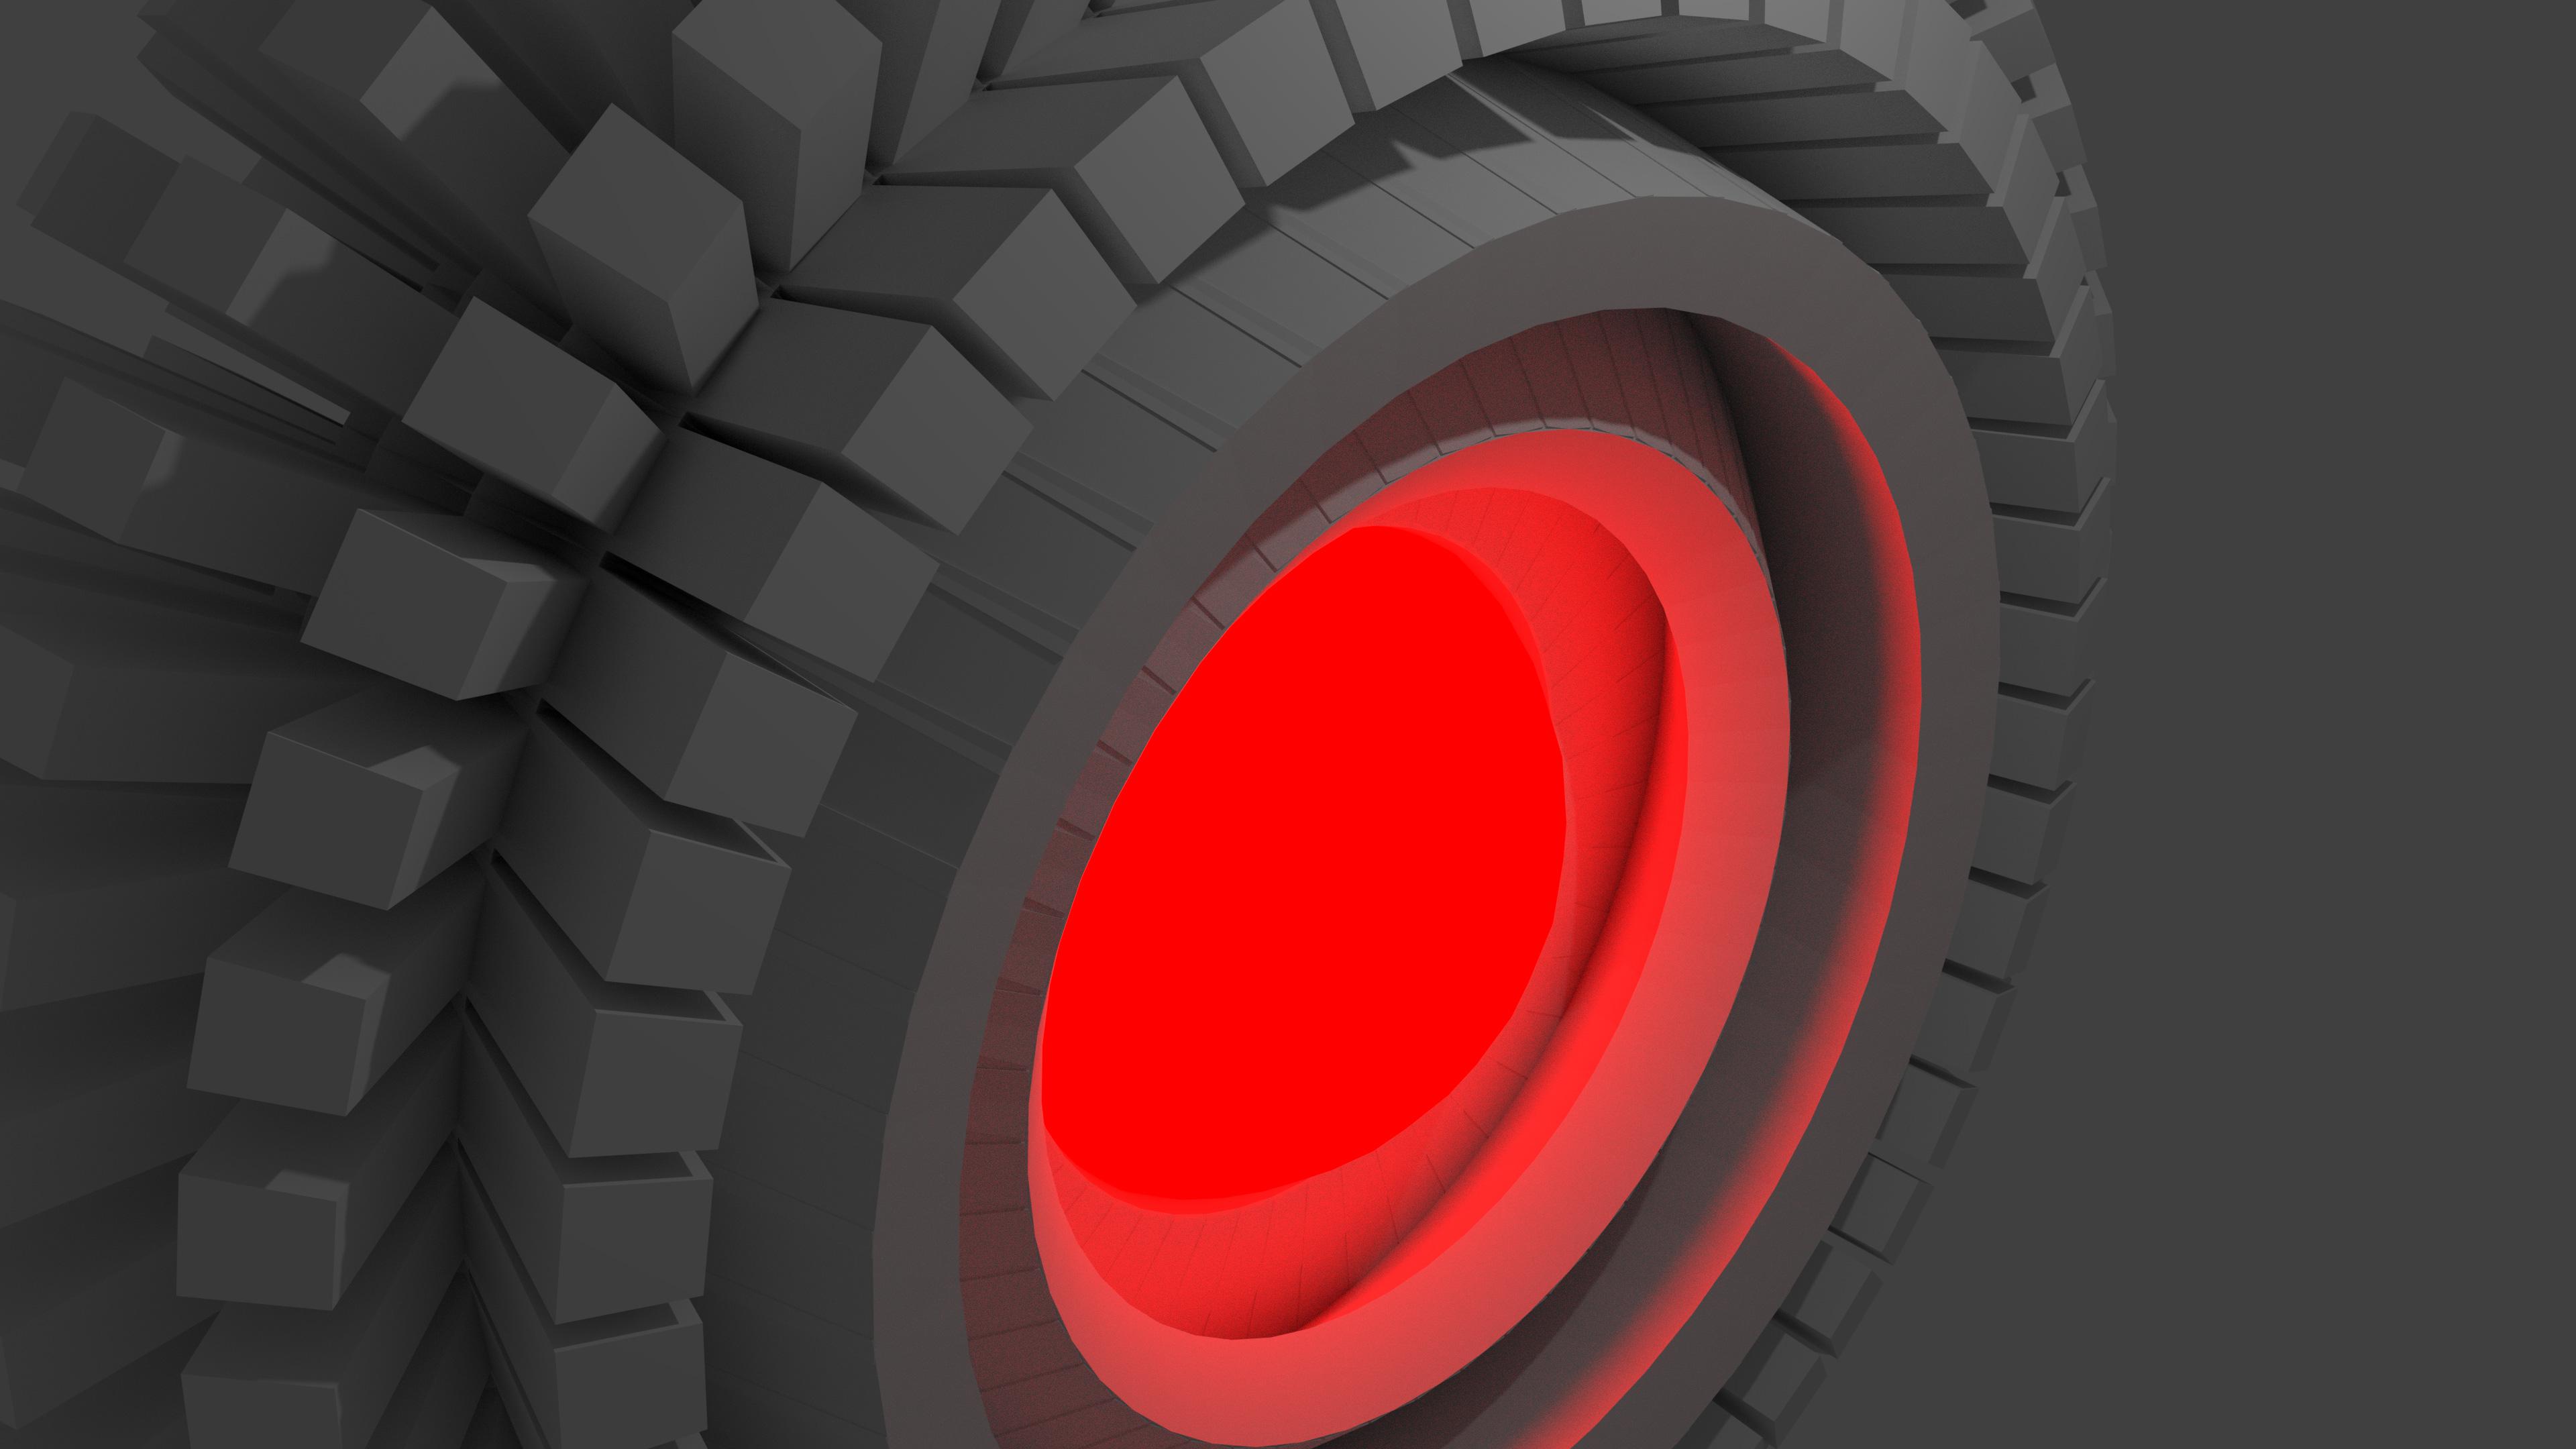 red abstract blender 4k 1539371301 - Red Abstract Blender 4k - shapes wallpapers, hd-wallpapers, digital art wallpapers, artwork wallpapers, artist wallpapers, abstract wallpapers, 4k-wallpapers